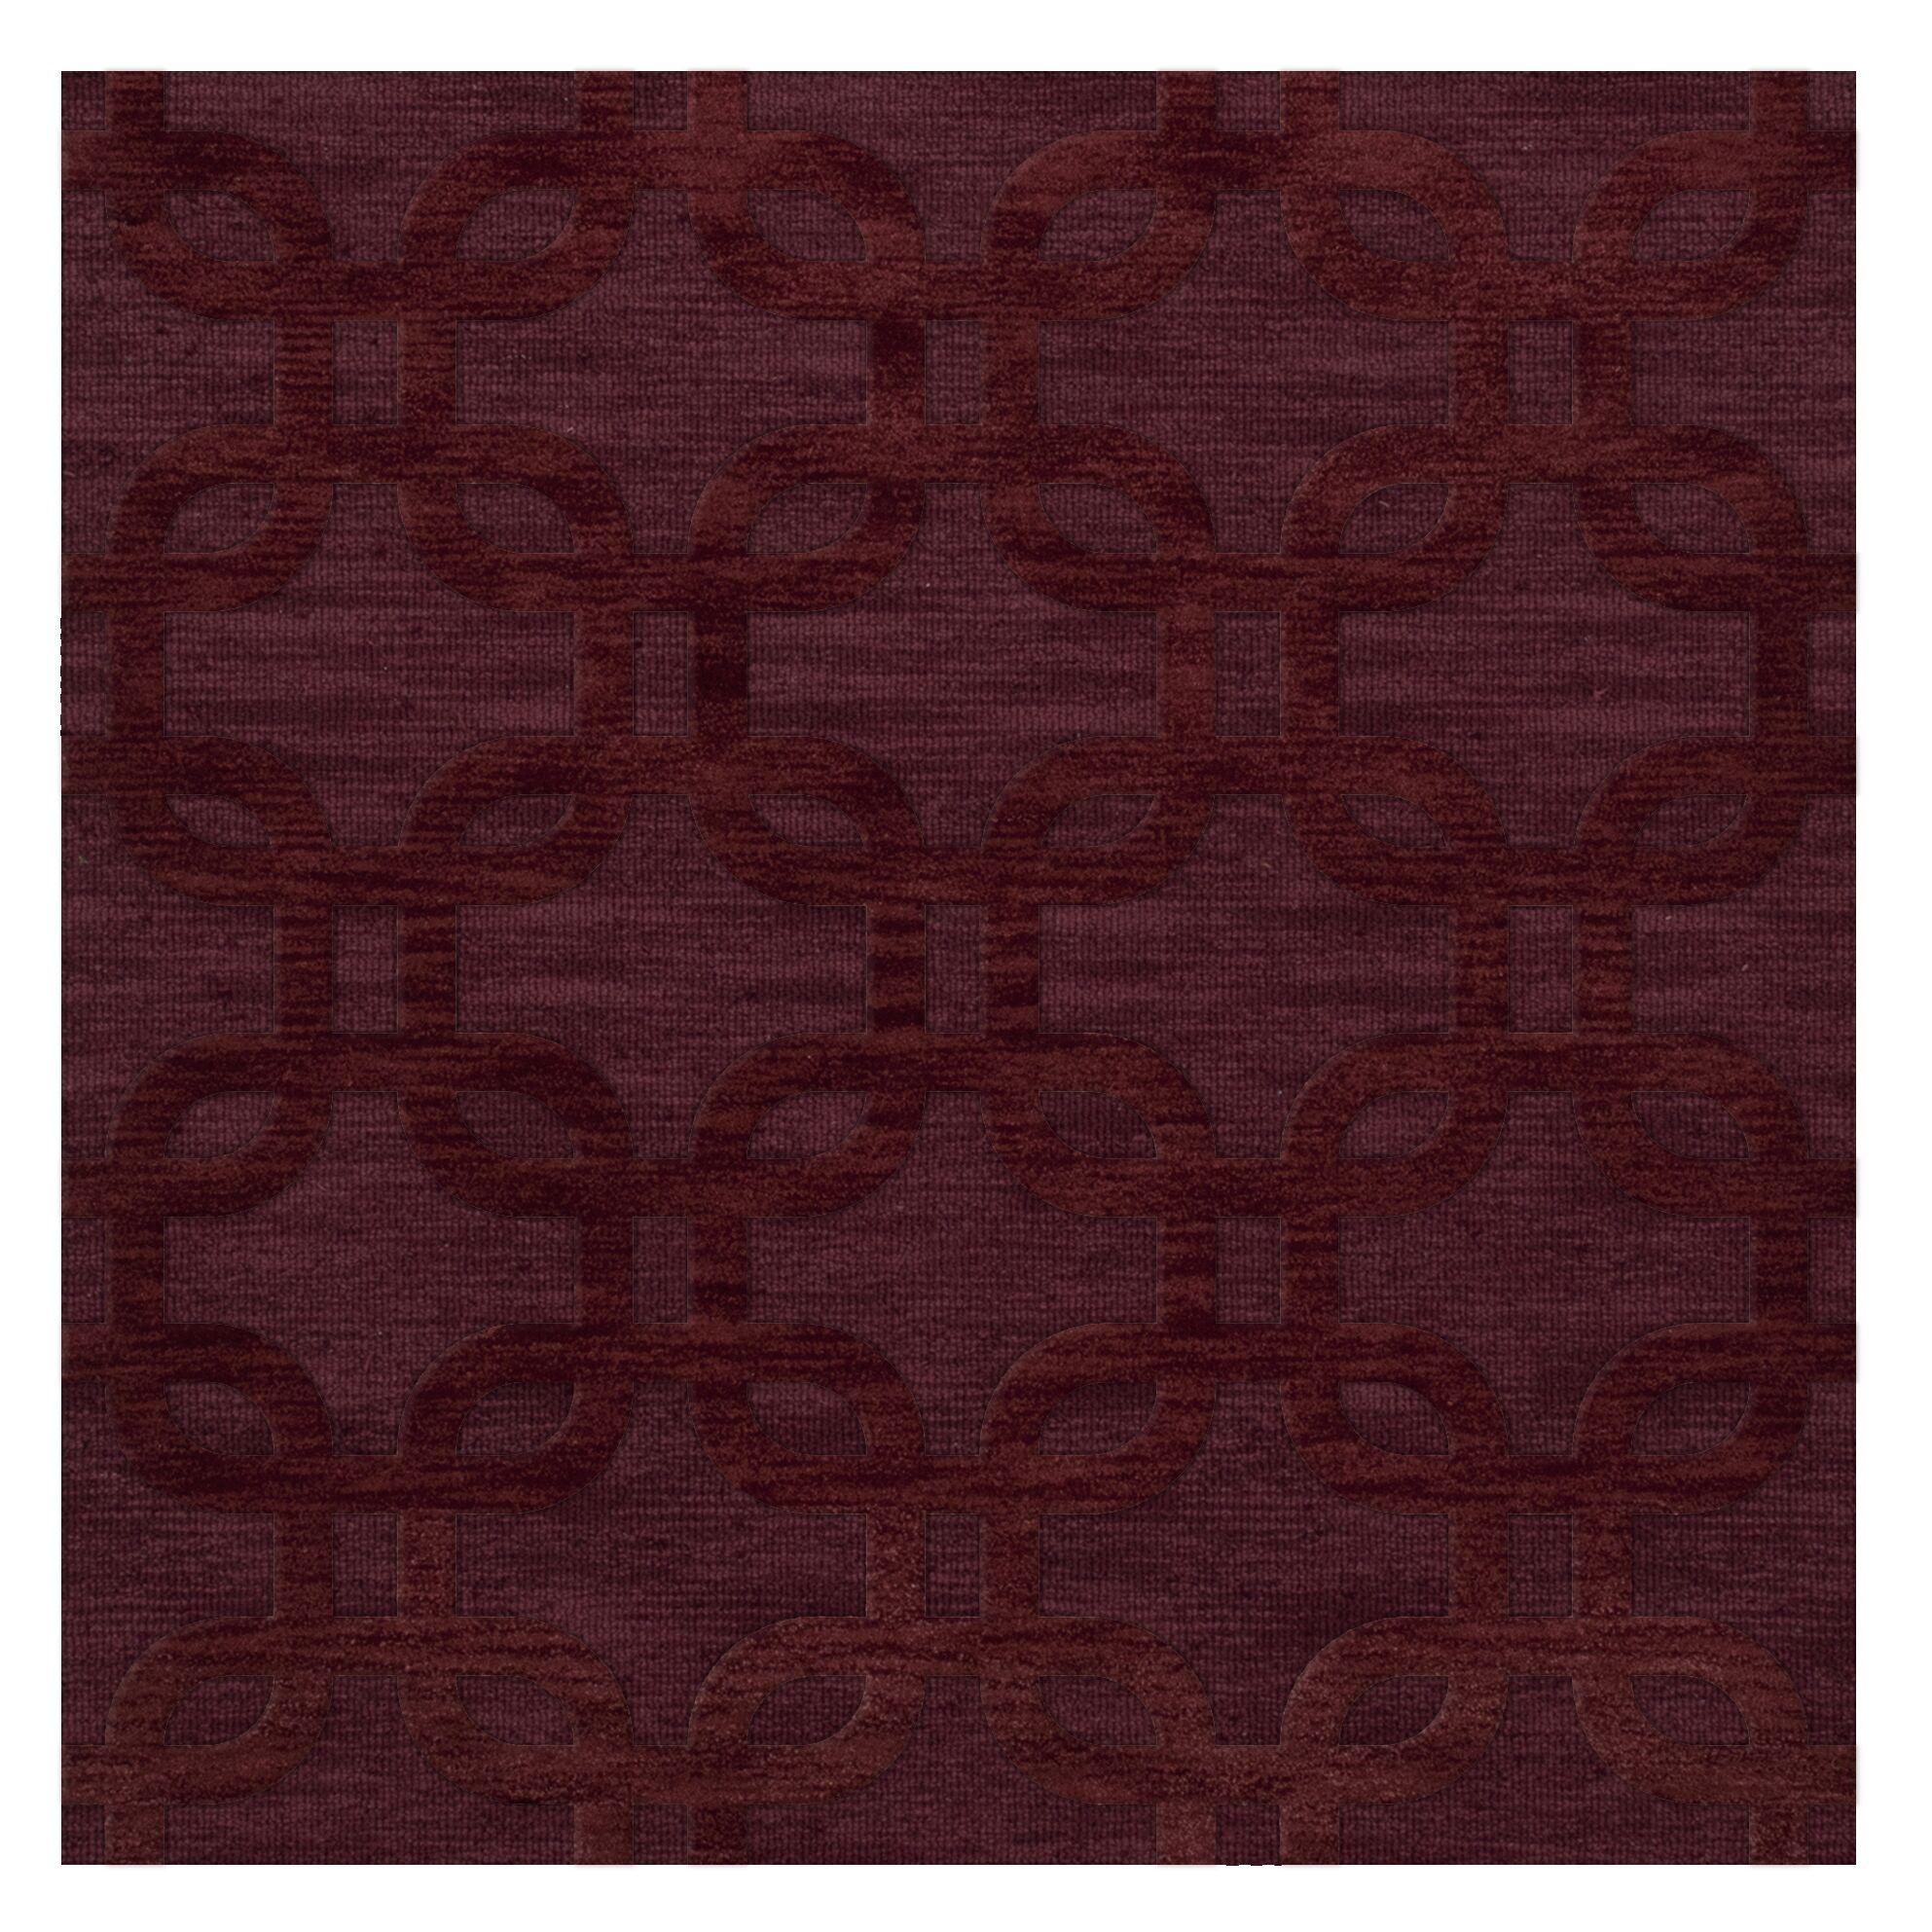 Dover Burgundy Area Rug Rug Size: Square 8'